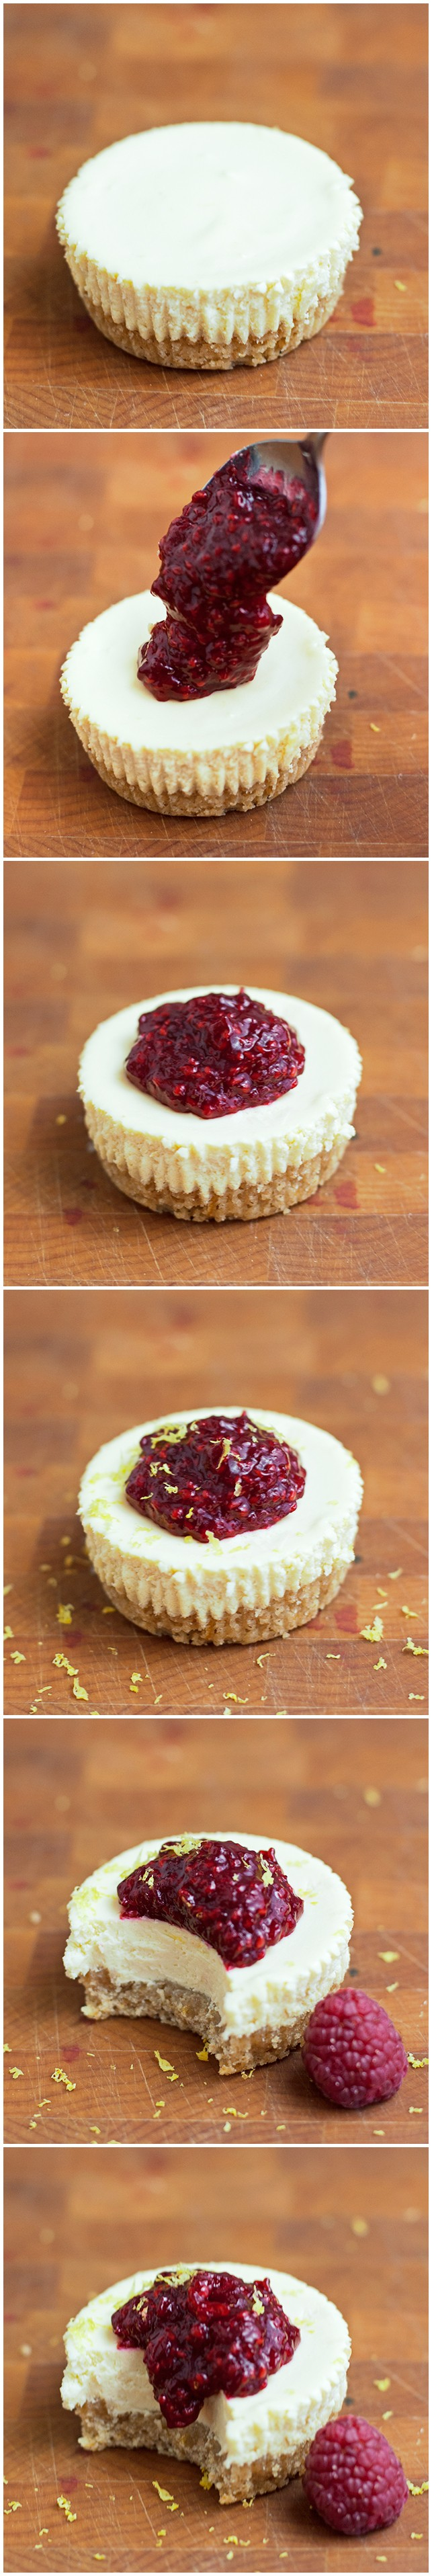 Lemon Raspberry Cheesecake - 2Teaspoons